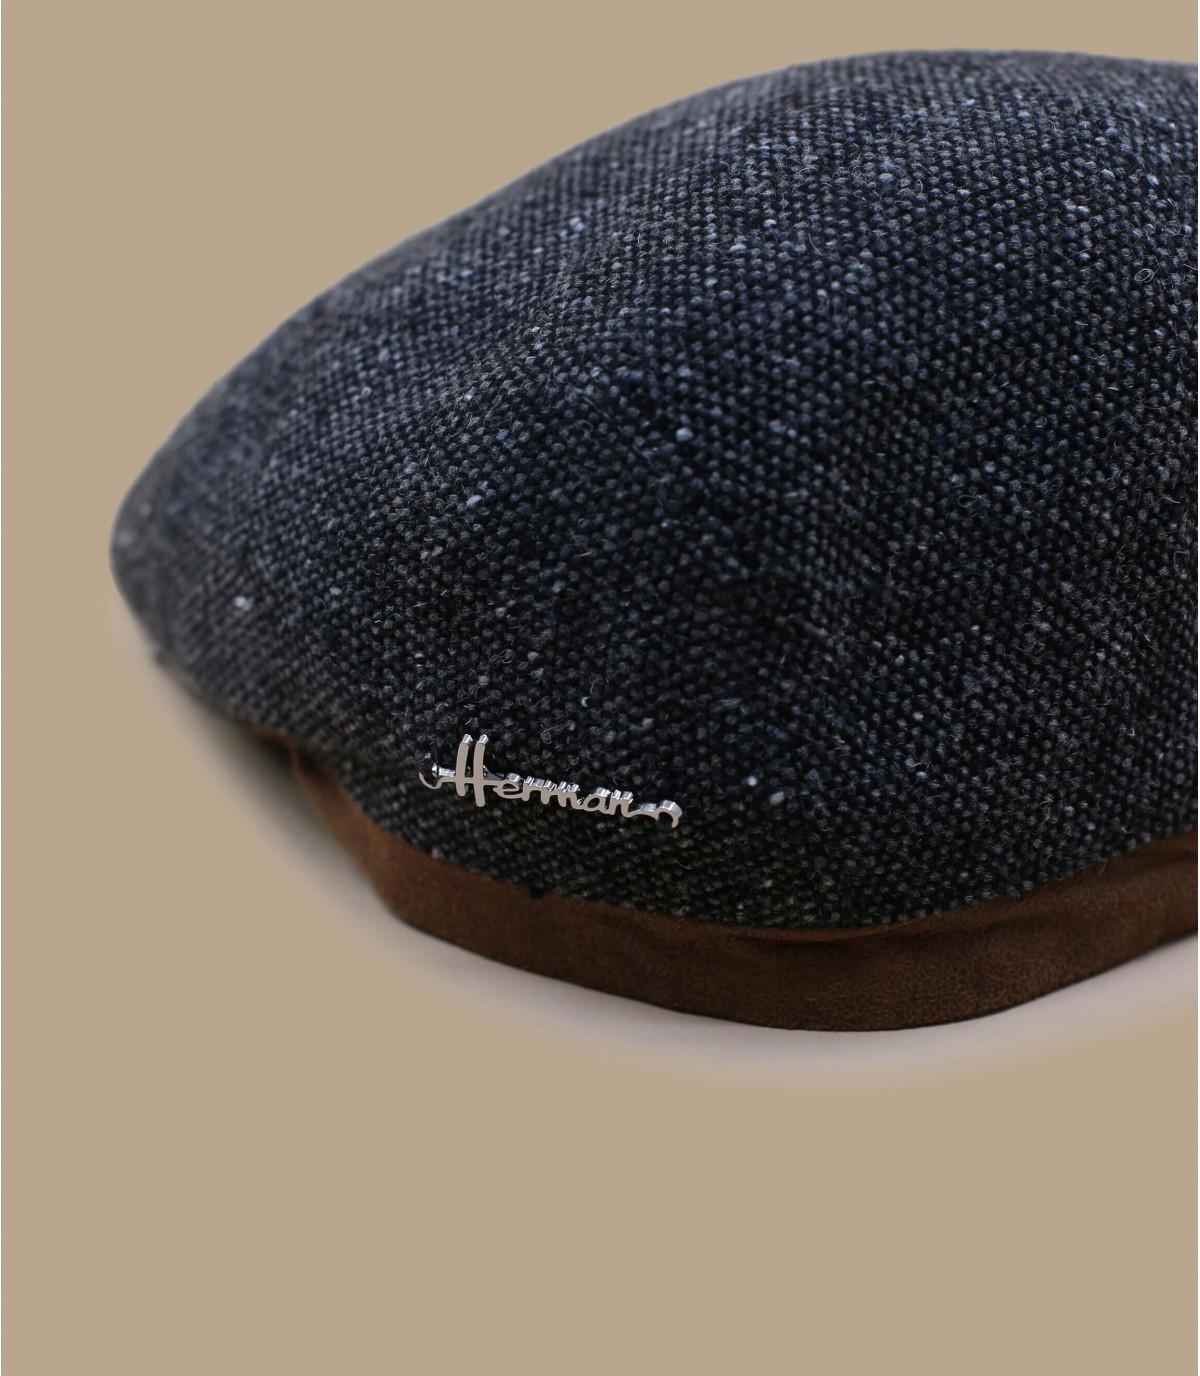 Détails Grasberg Wool charcoal - image 2